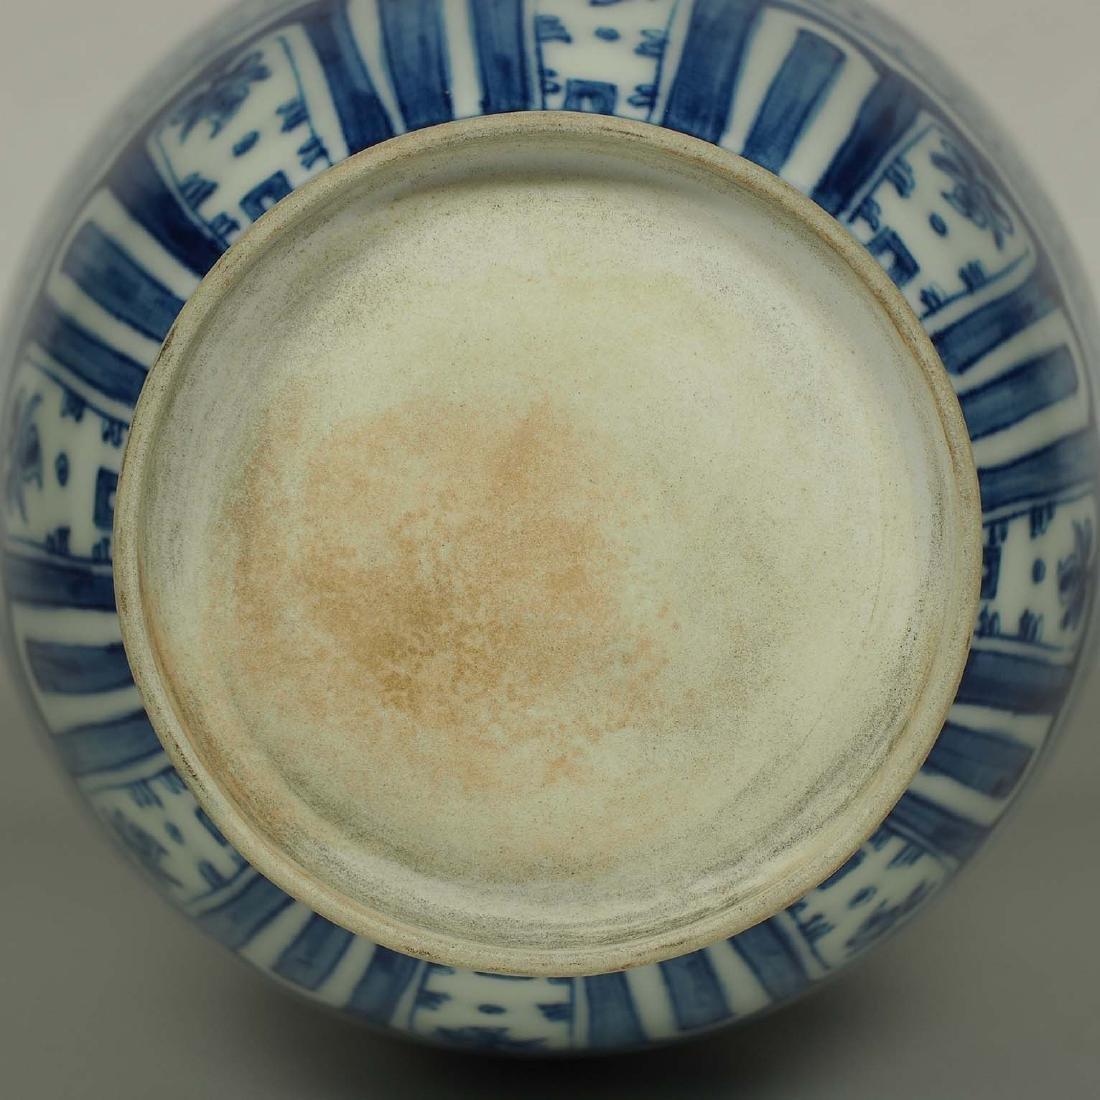 Vase with Flying Cranes Design, Ming Dynasty - 7